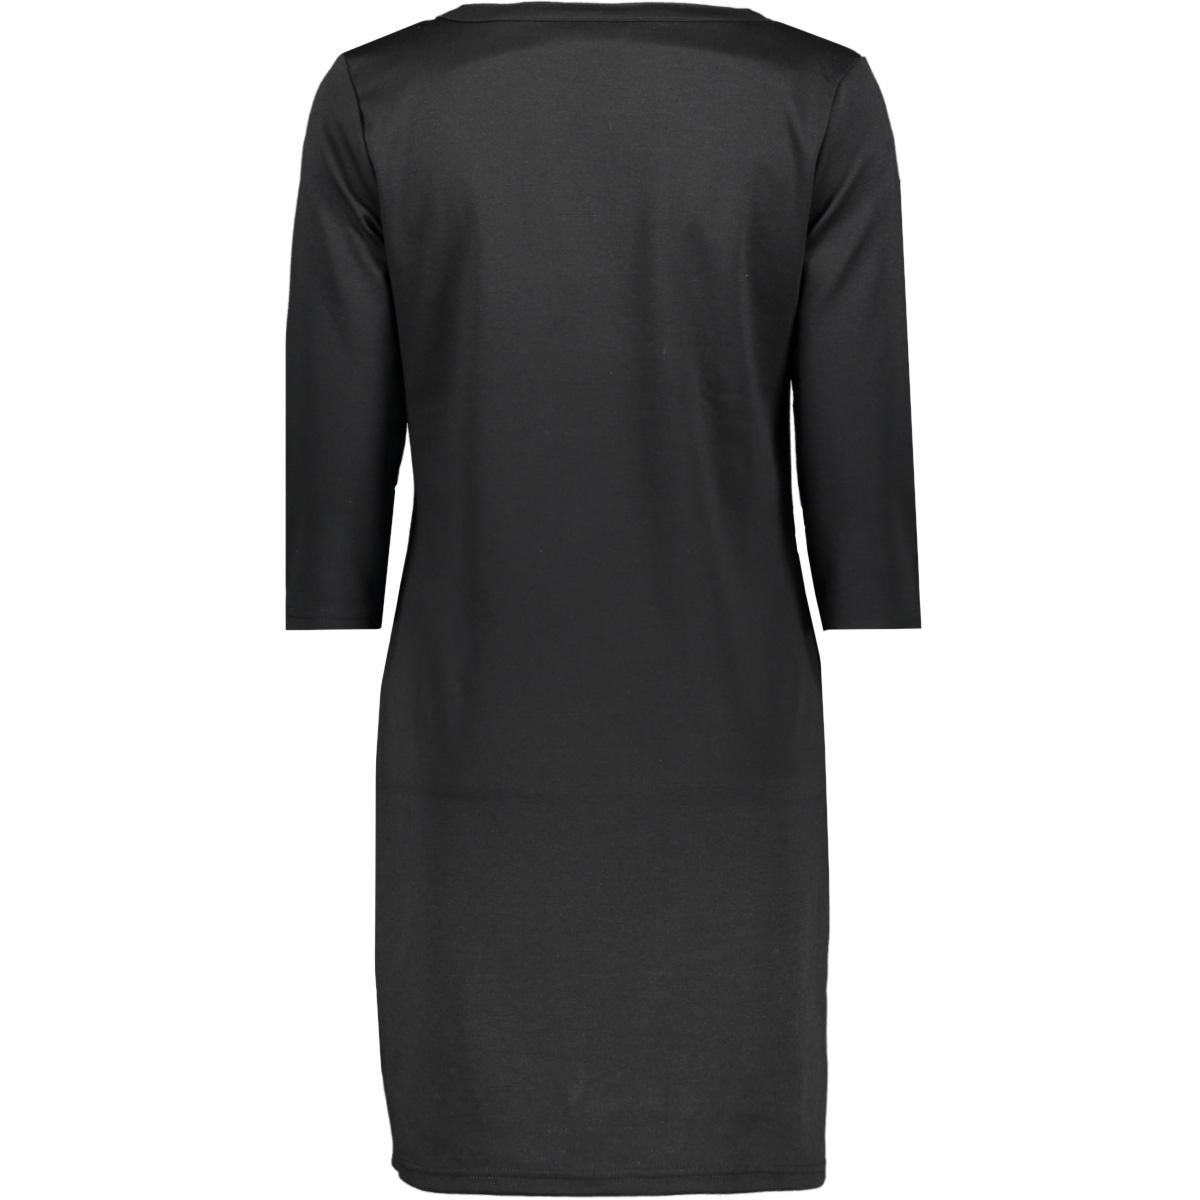 vitinny 3/4 sleeve v-neck dress 14052539 vila jurk black